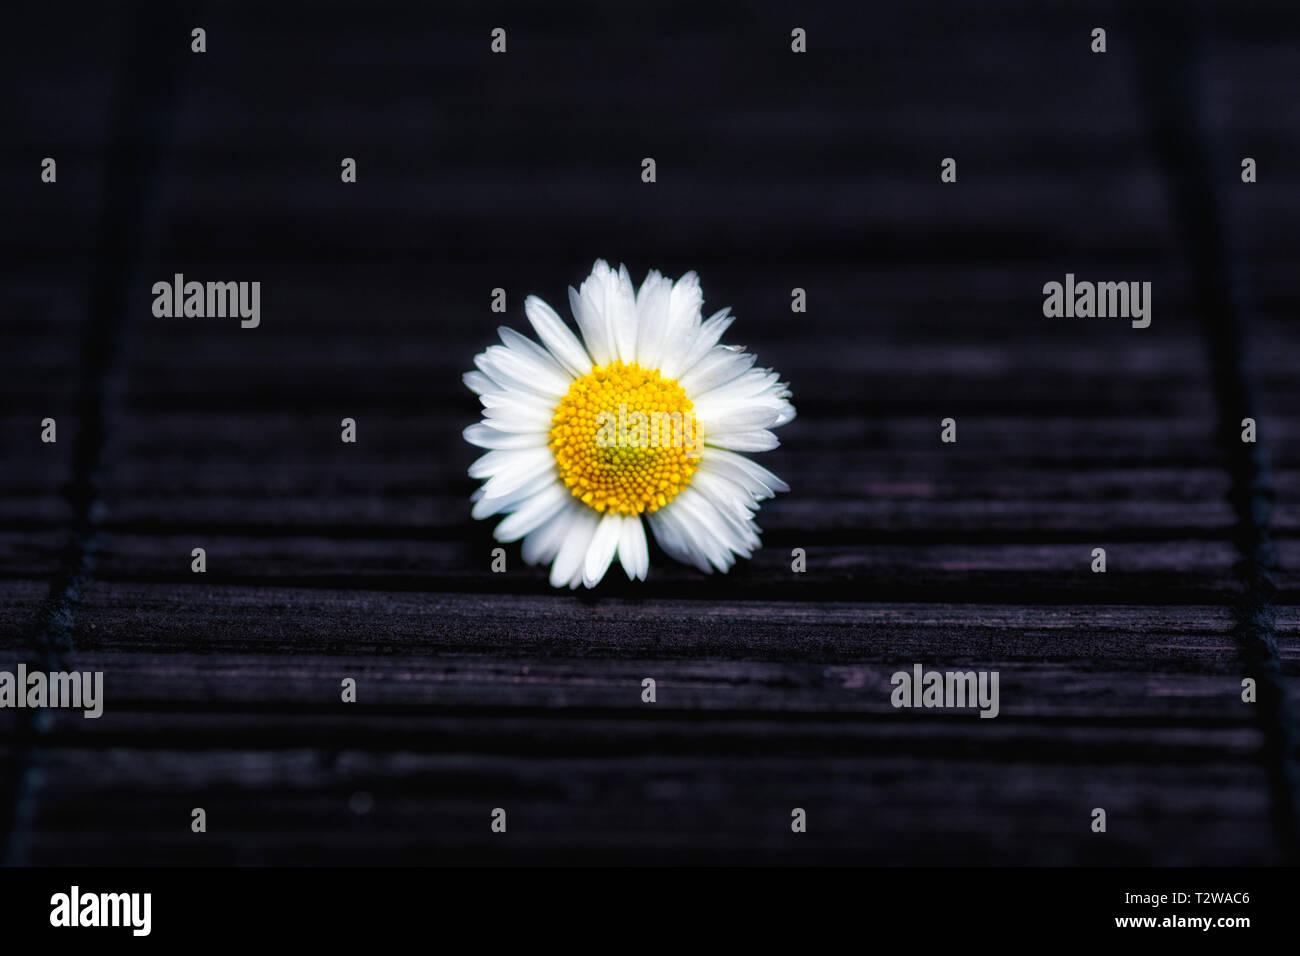 daisy in the dark - Stock Image